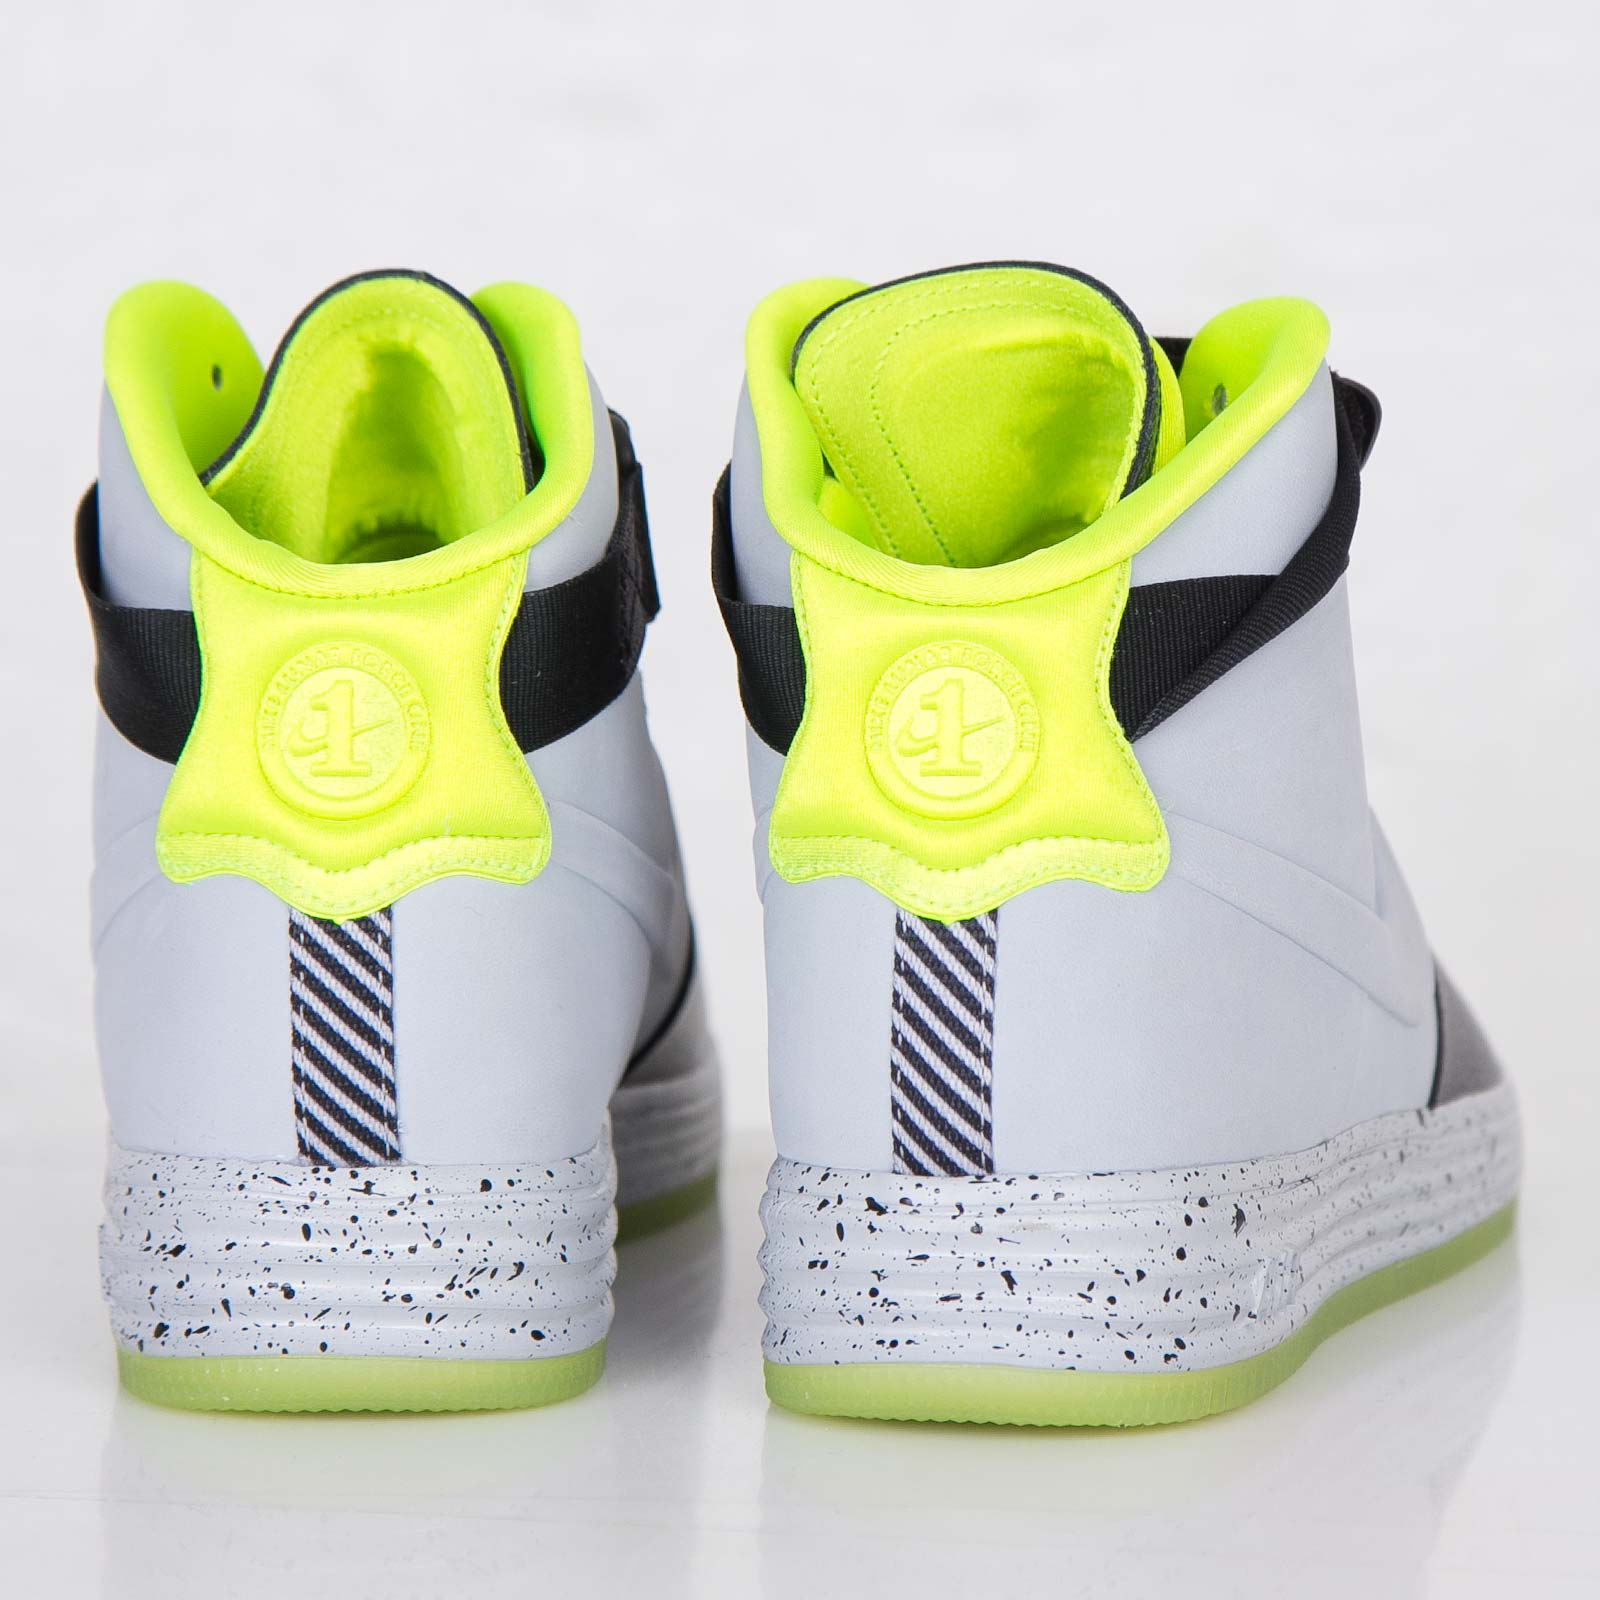 Nike Lunar Force 1 Lux VT 630998 002 Sneakersnstuff